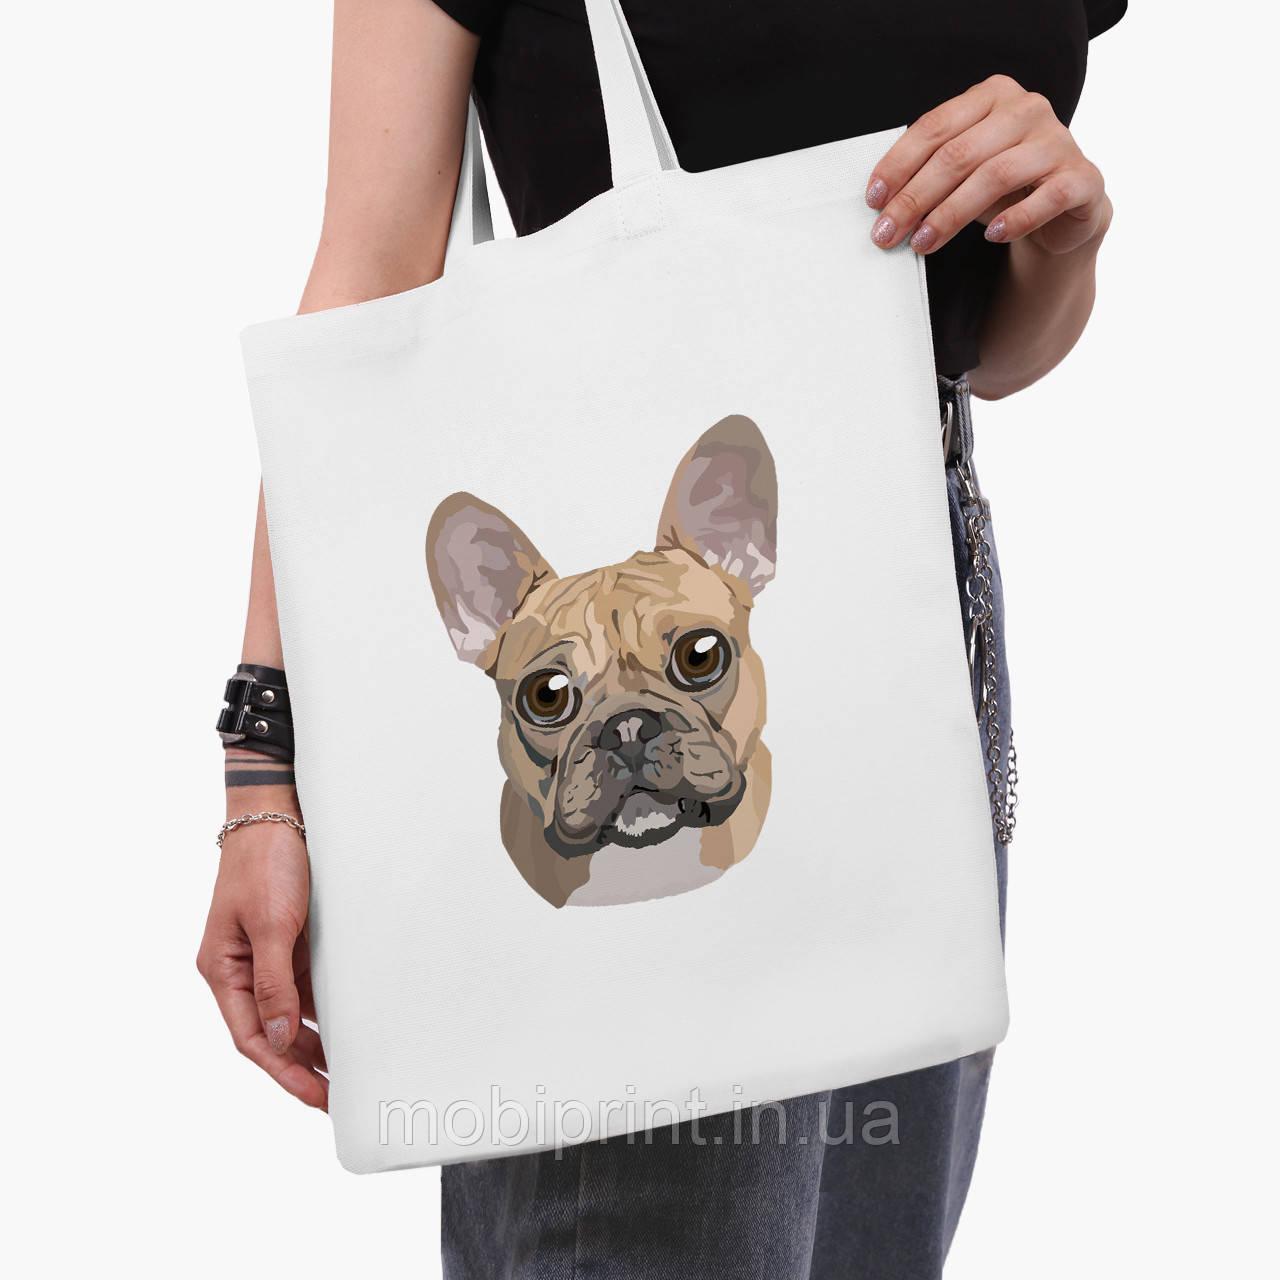 Эко сумка шоппер белая Французкий бульдог (9227-2857-3)  41*35 см